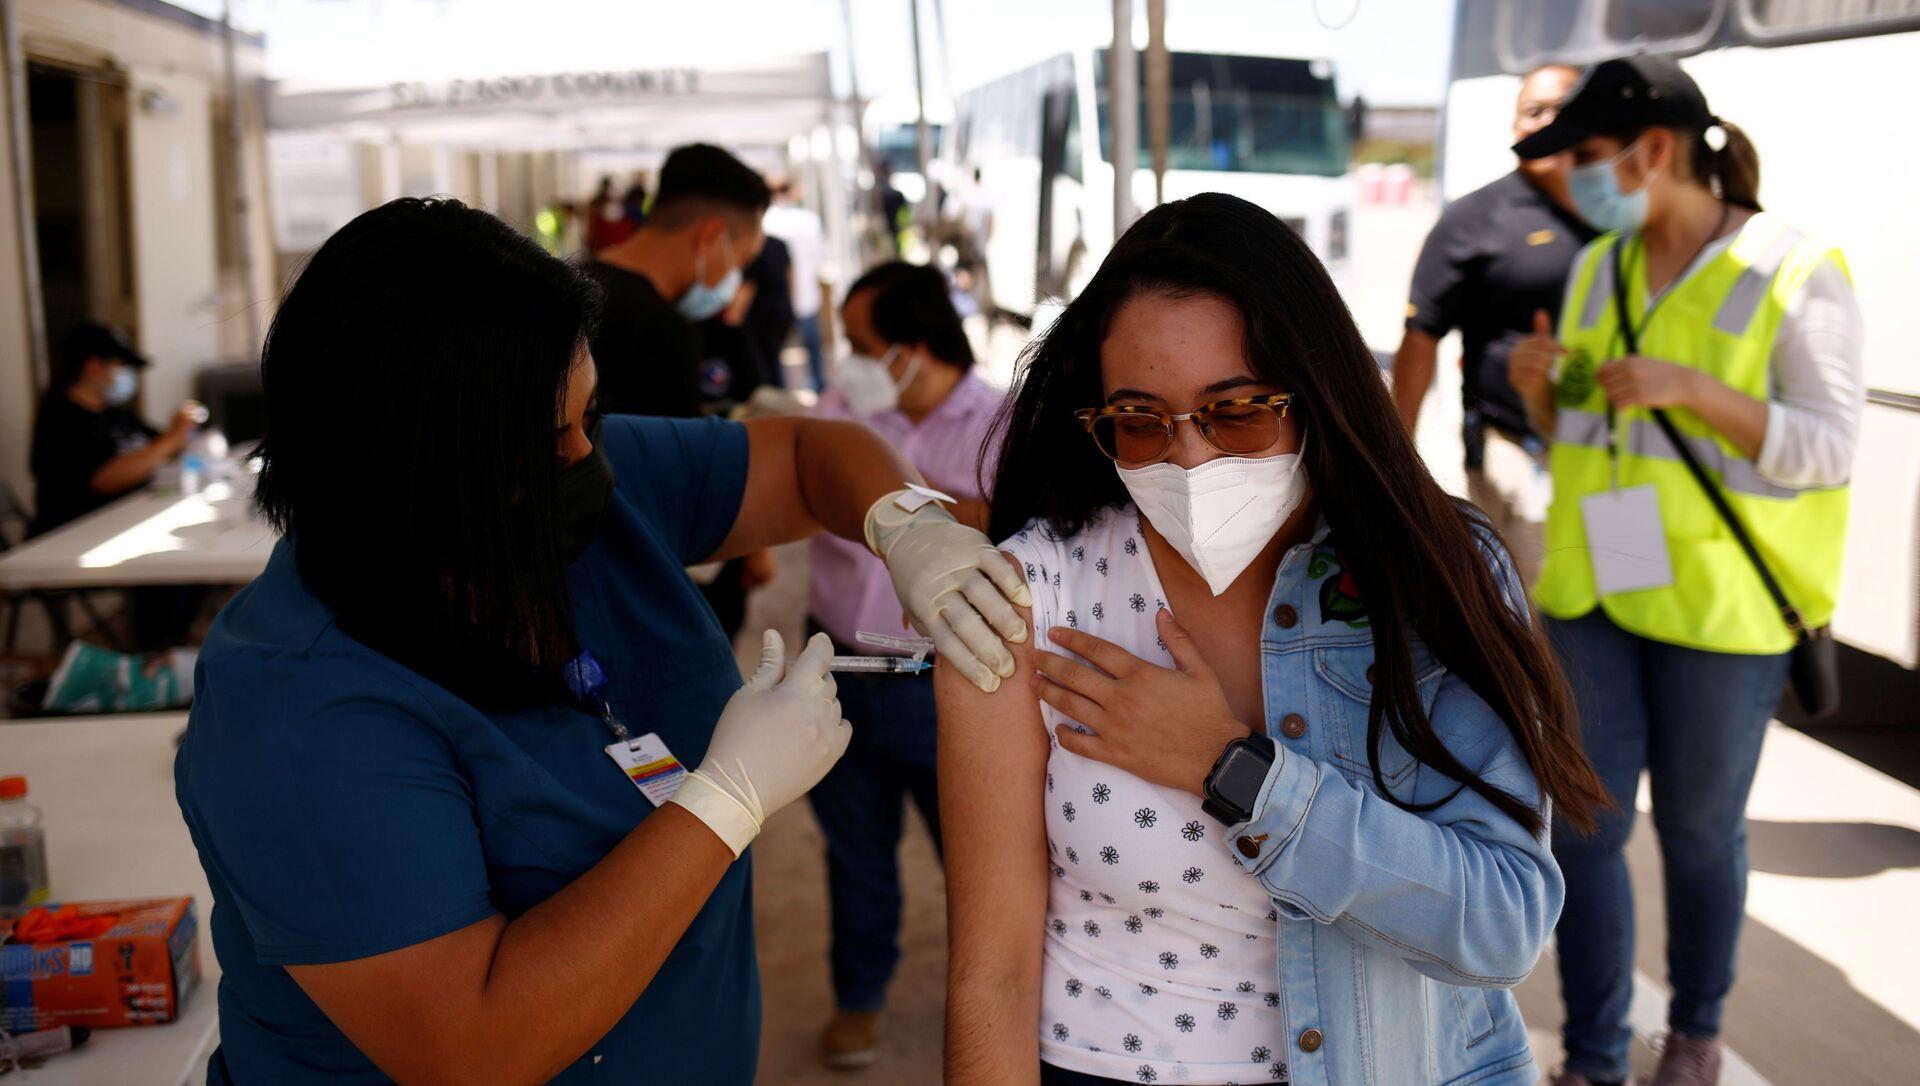 A Mexican woman receives a dose of the Johnson & Johnson coronavirus disease (COVID-19) vaccine, during a binational vaccination program, at the Tornillo-Guadalupe international bridge, in Tornillo, Texas, U.S., July 28, 2021 - Sputnik International, 1920, 05.08.2021